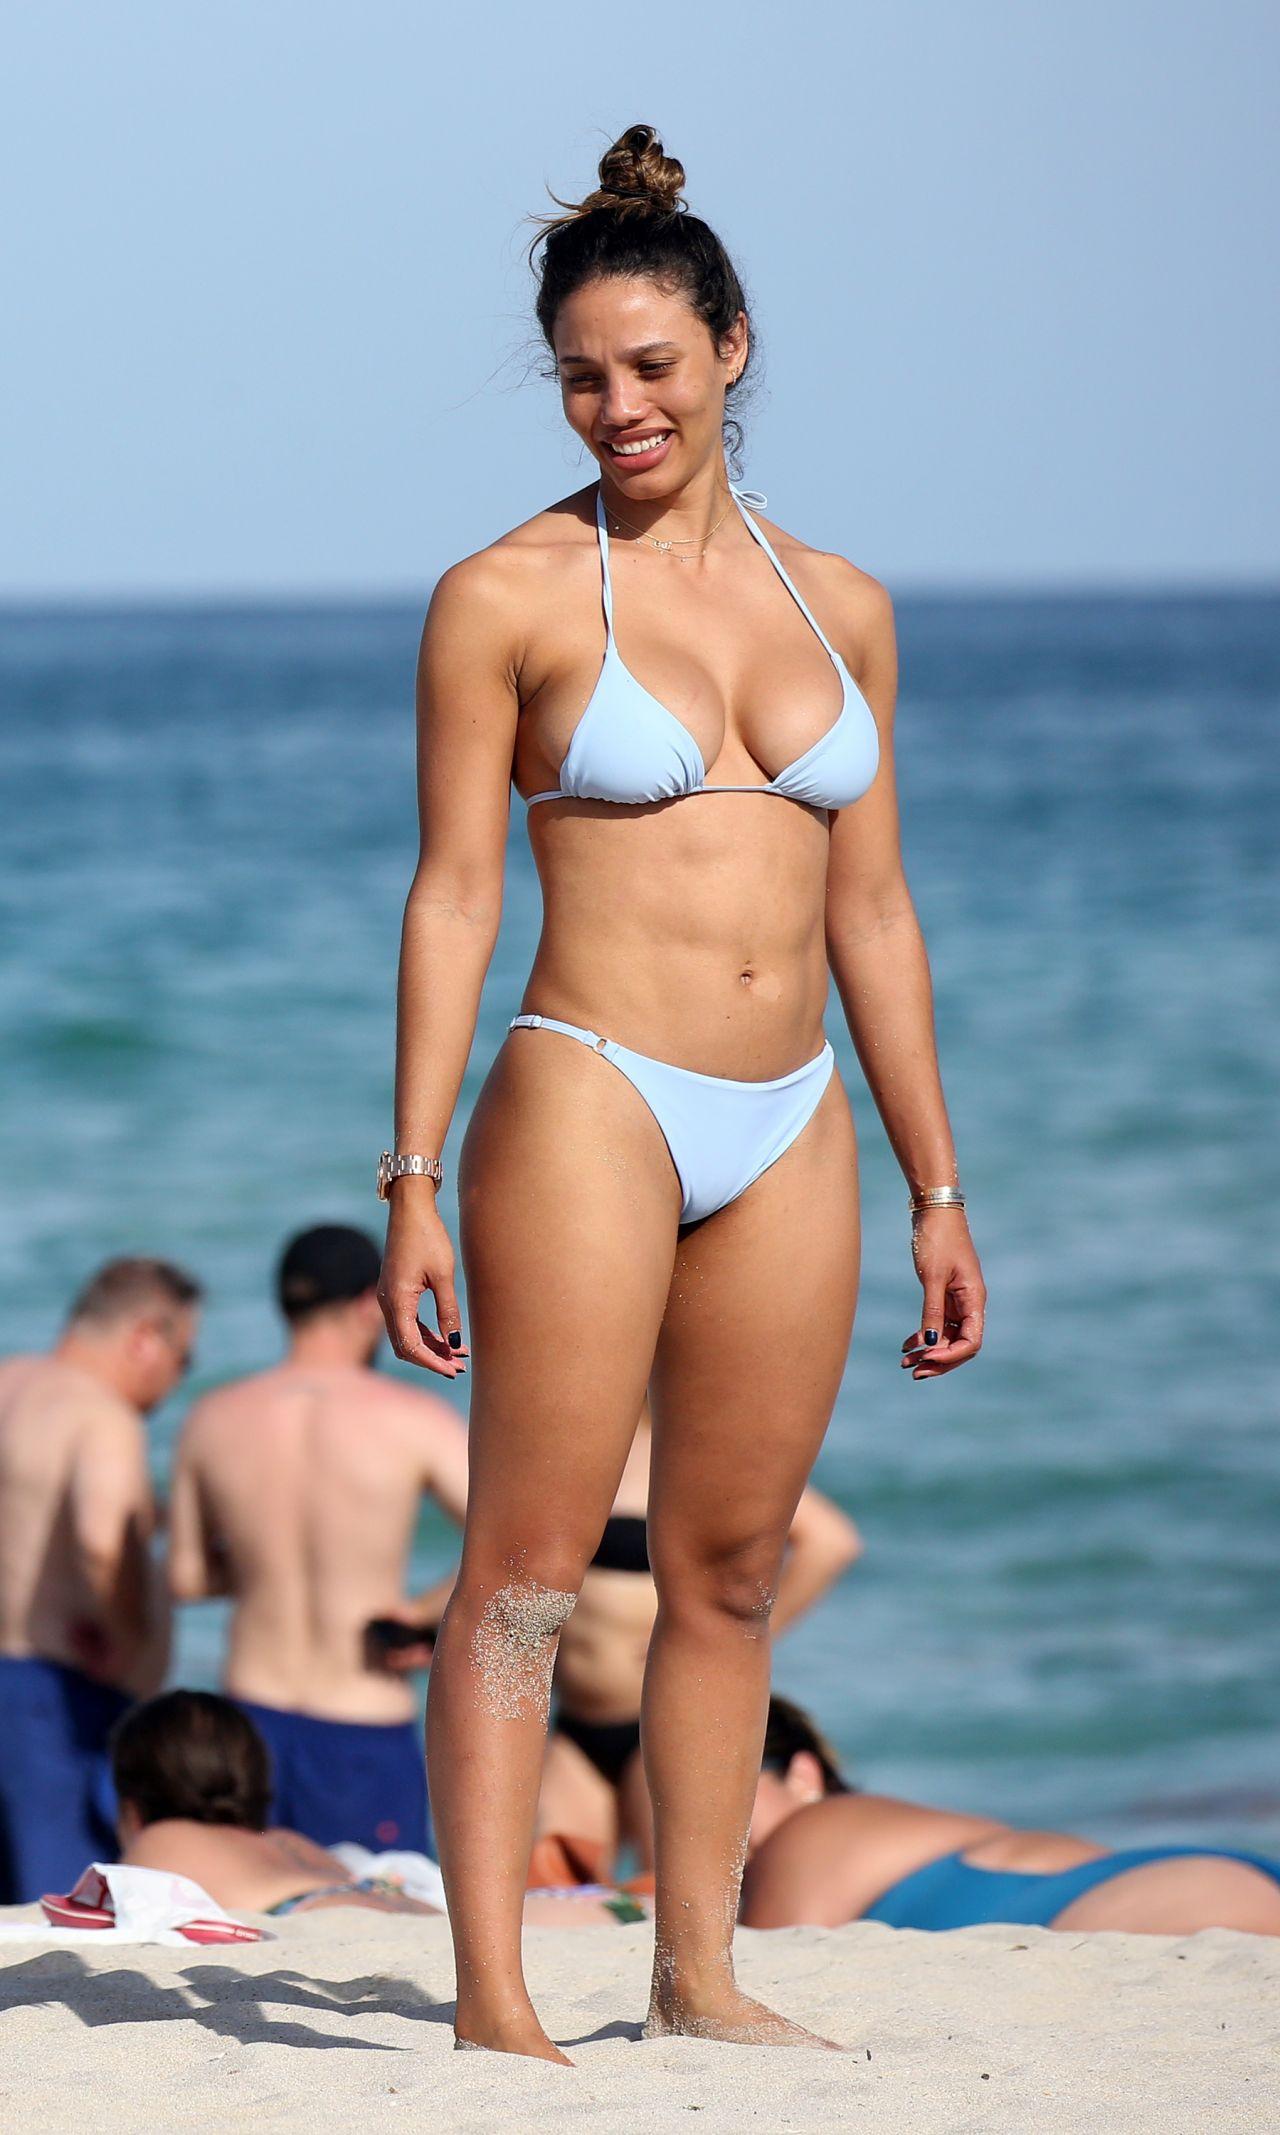 Bikini Daniela Freitas nude (95 photo), Topless, Bikini, Twitter, butt 2006